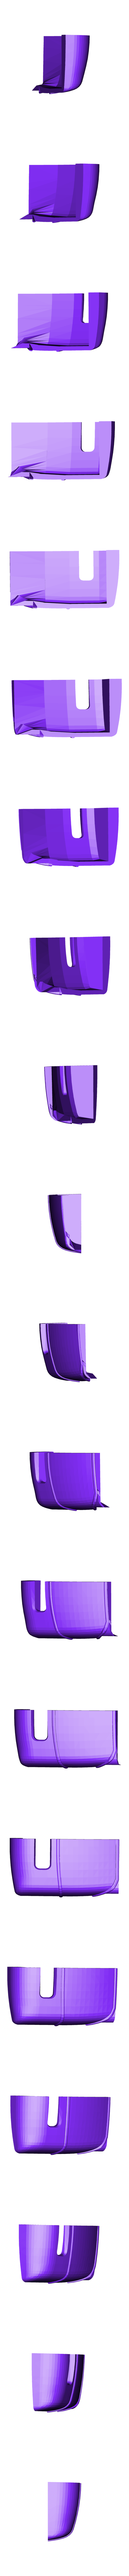 hotrod flanc 6.stl Download STL file Fury road hotrod bodyshell 1/10 • 3D printing design, RCGANG93